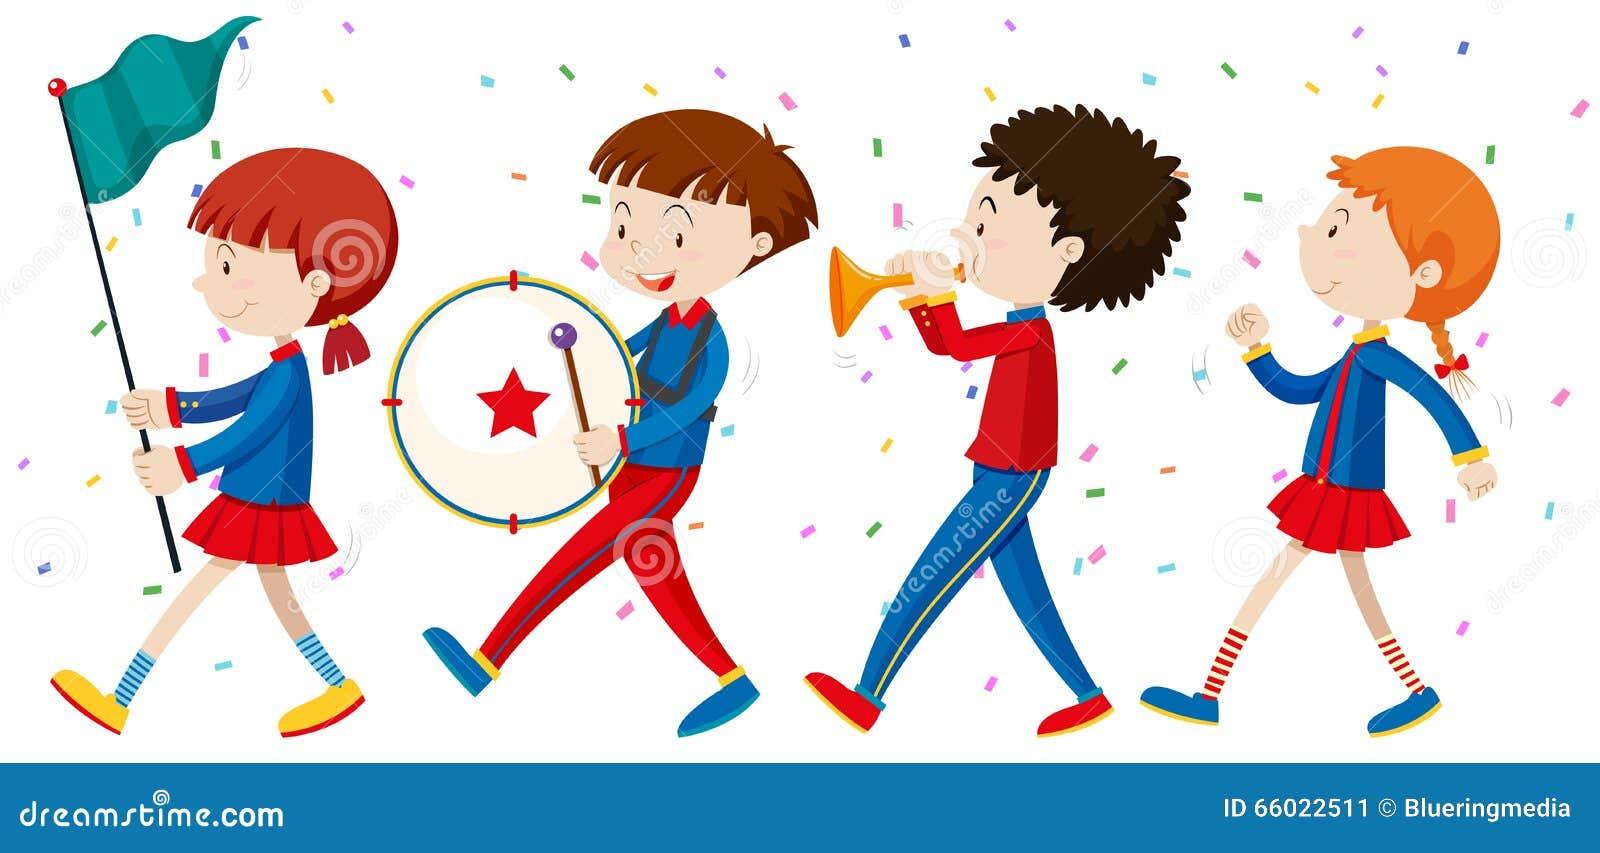 Kids Marching Stock Illustrations – 54 Kids Marching Stock Illustrations,  Vectors & Clipart - Dreamstime